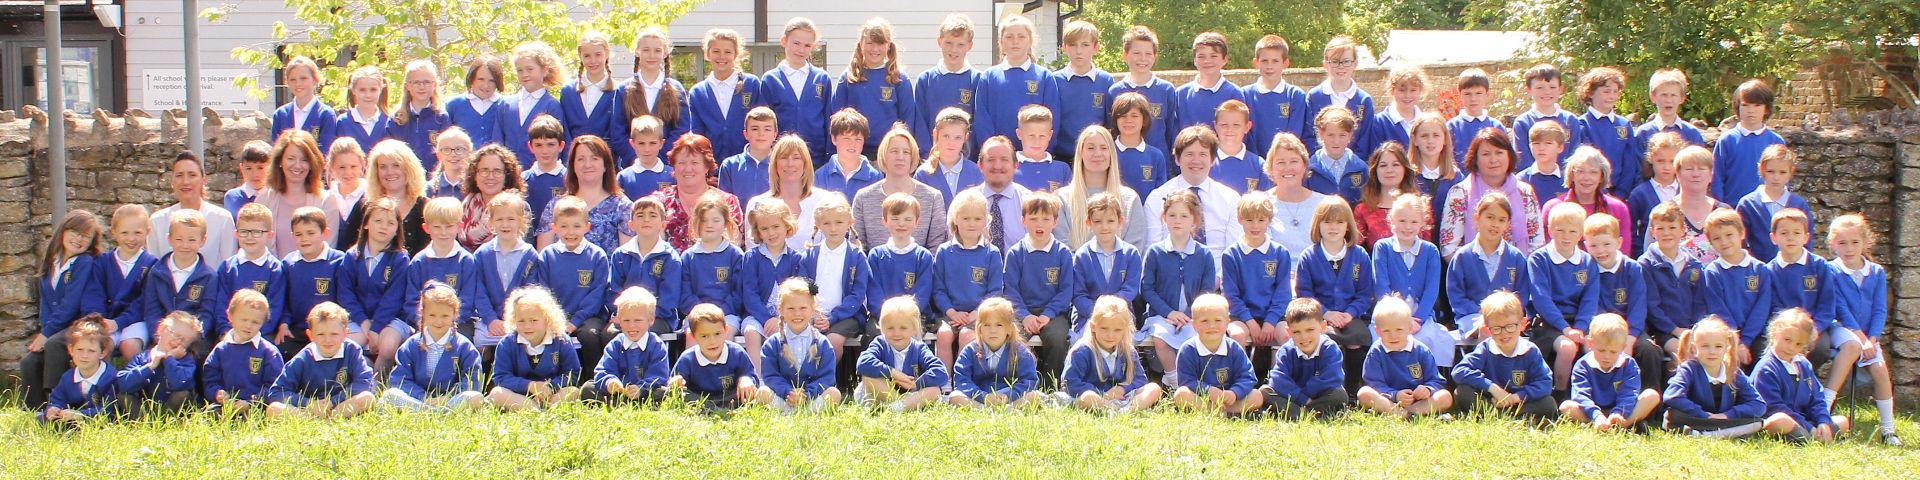 Whole School photograph – 2017